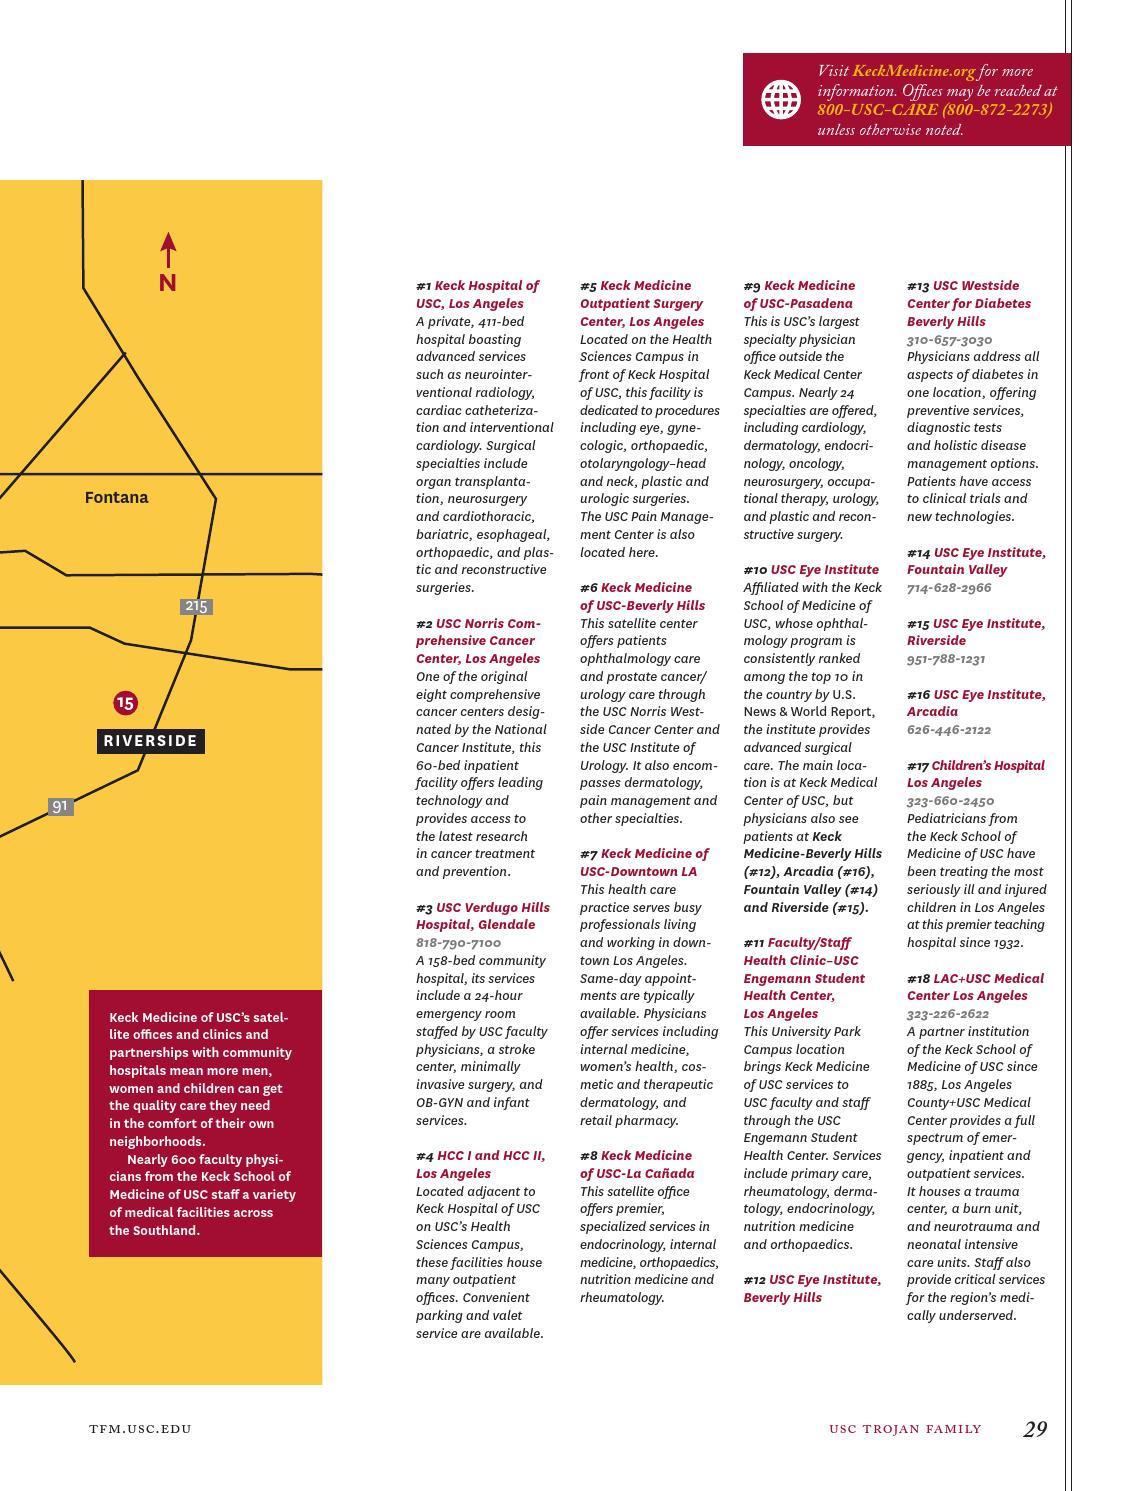 Trojan Family Magazine Winter 2013 by University of Southern